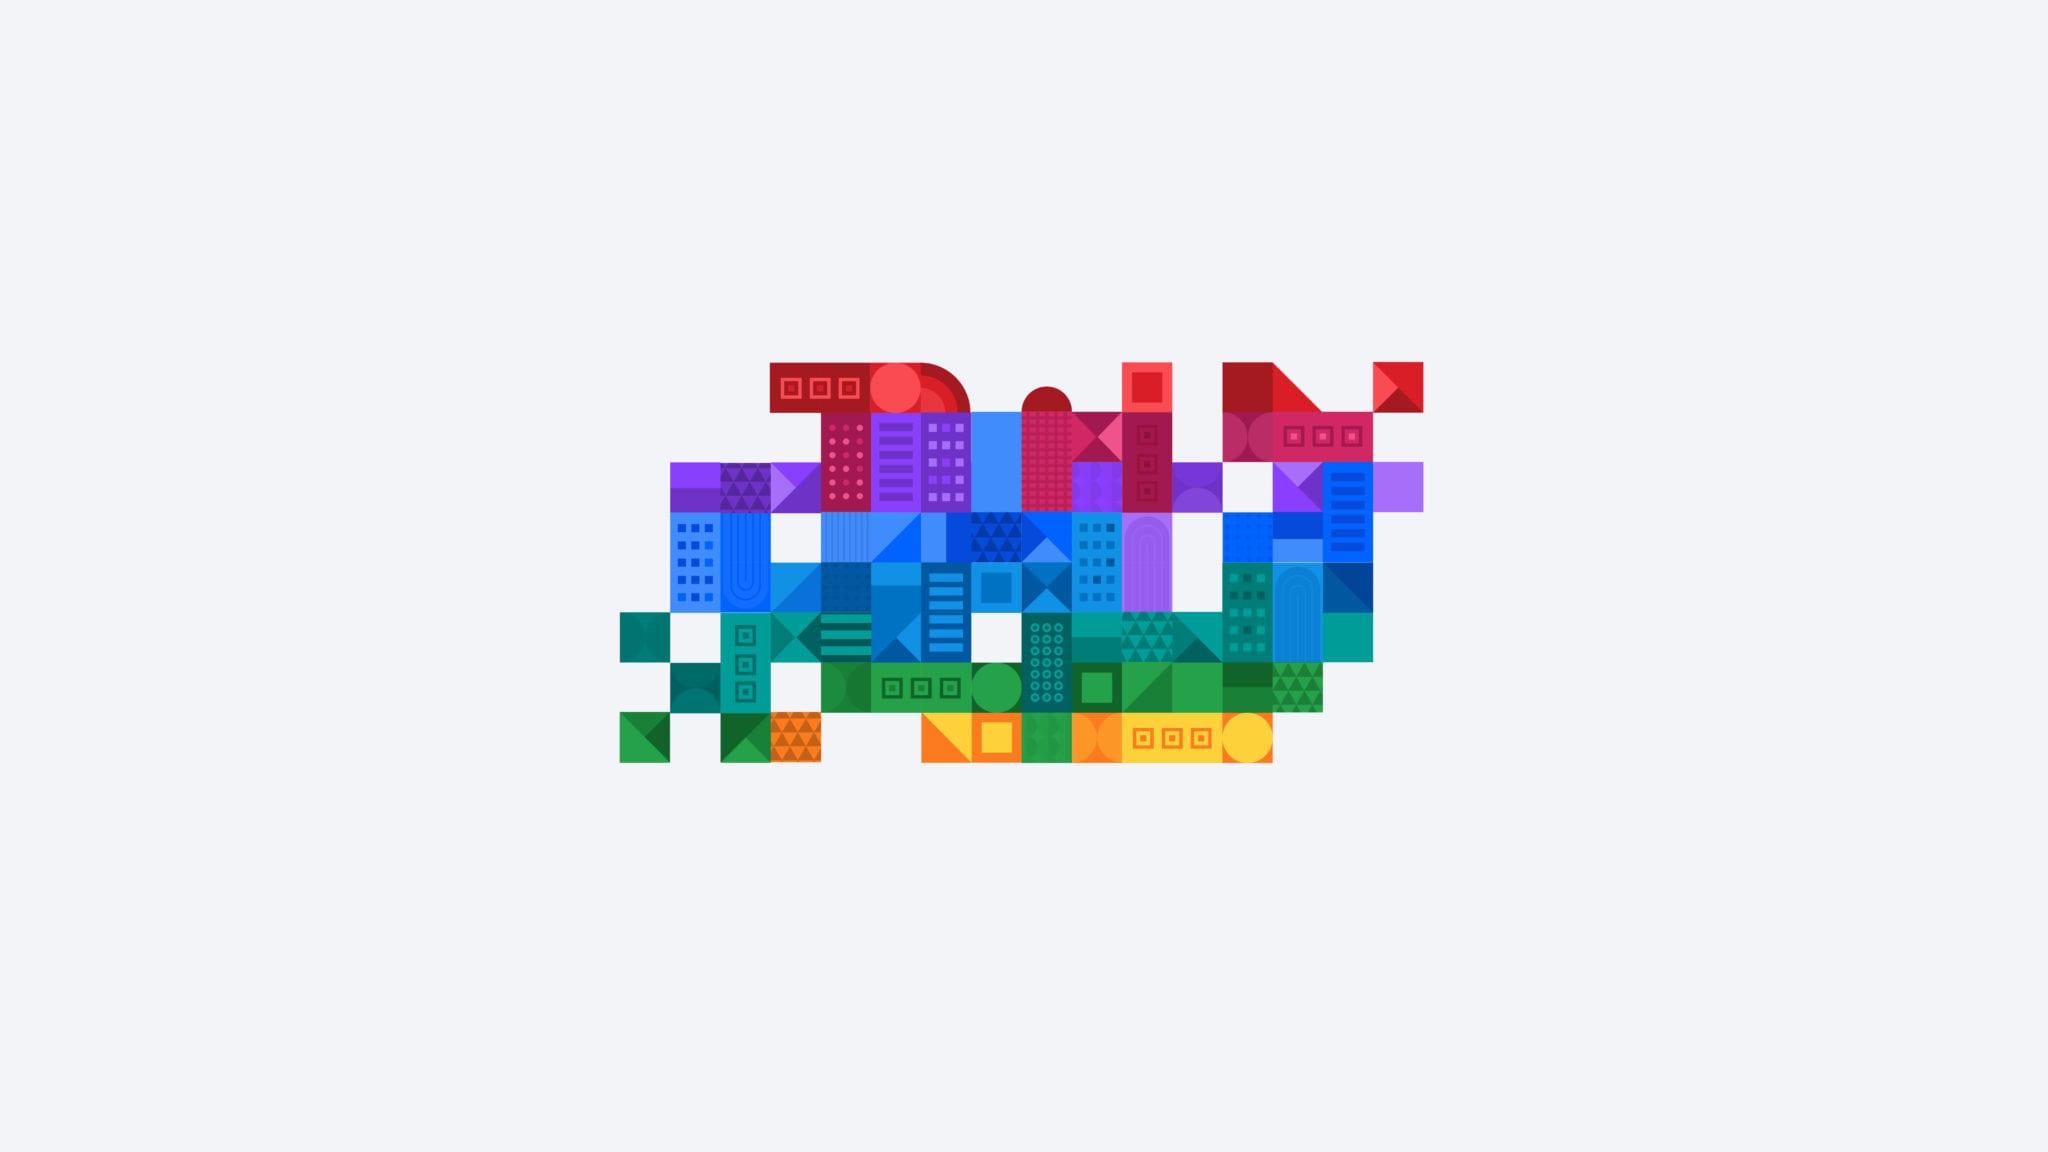 IBM-02-18